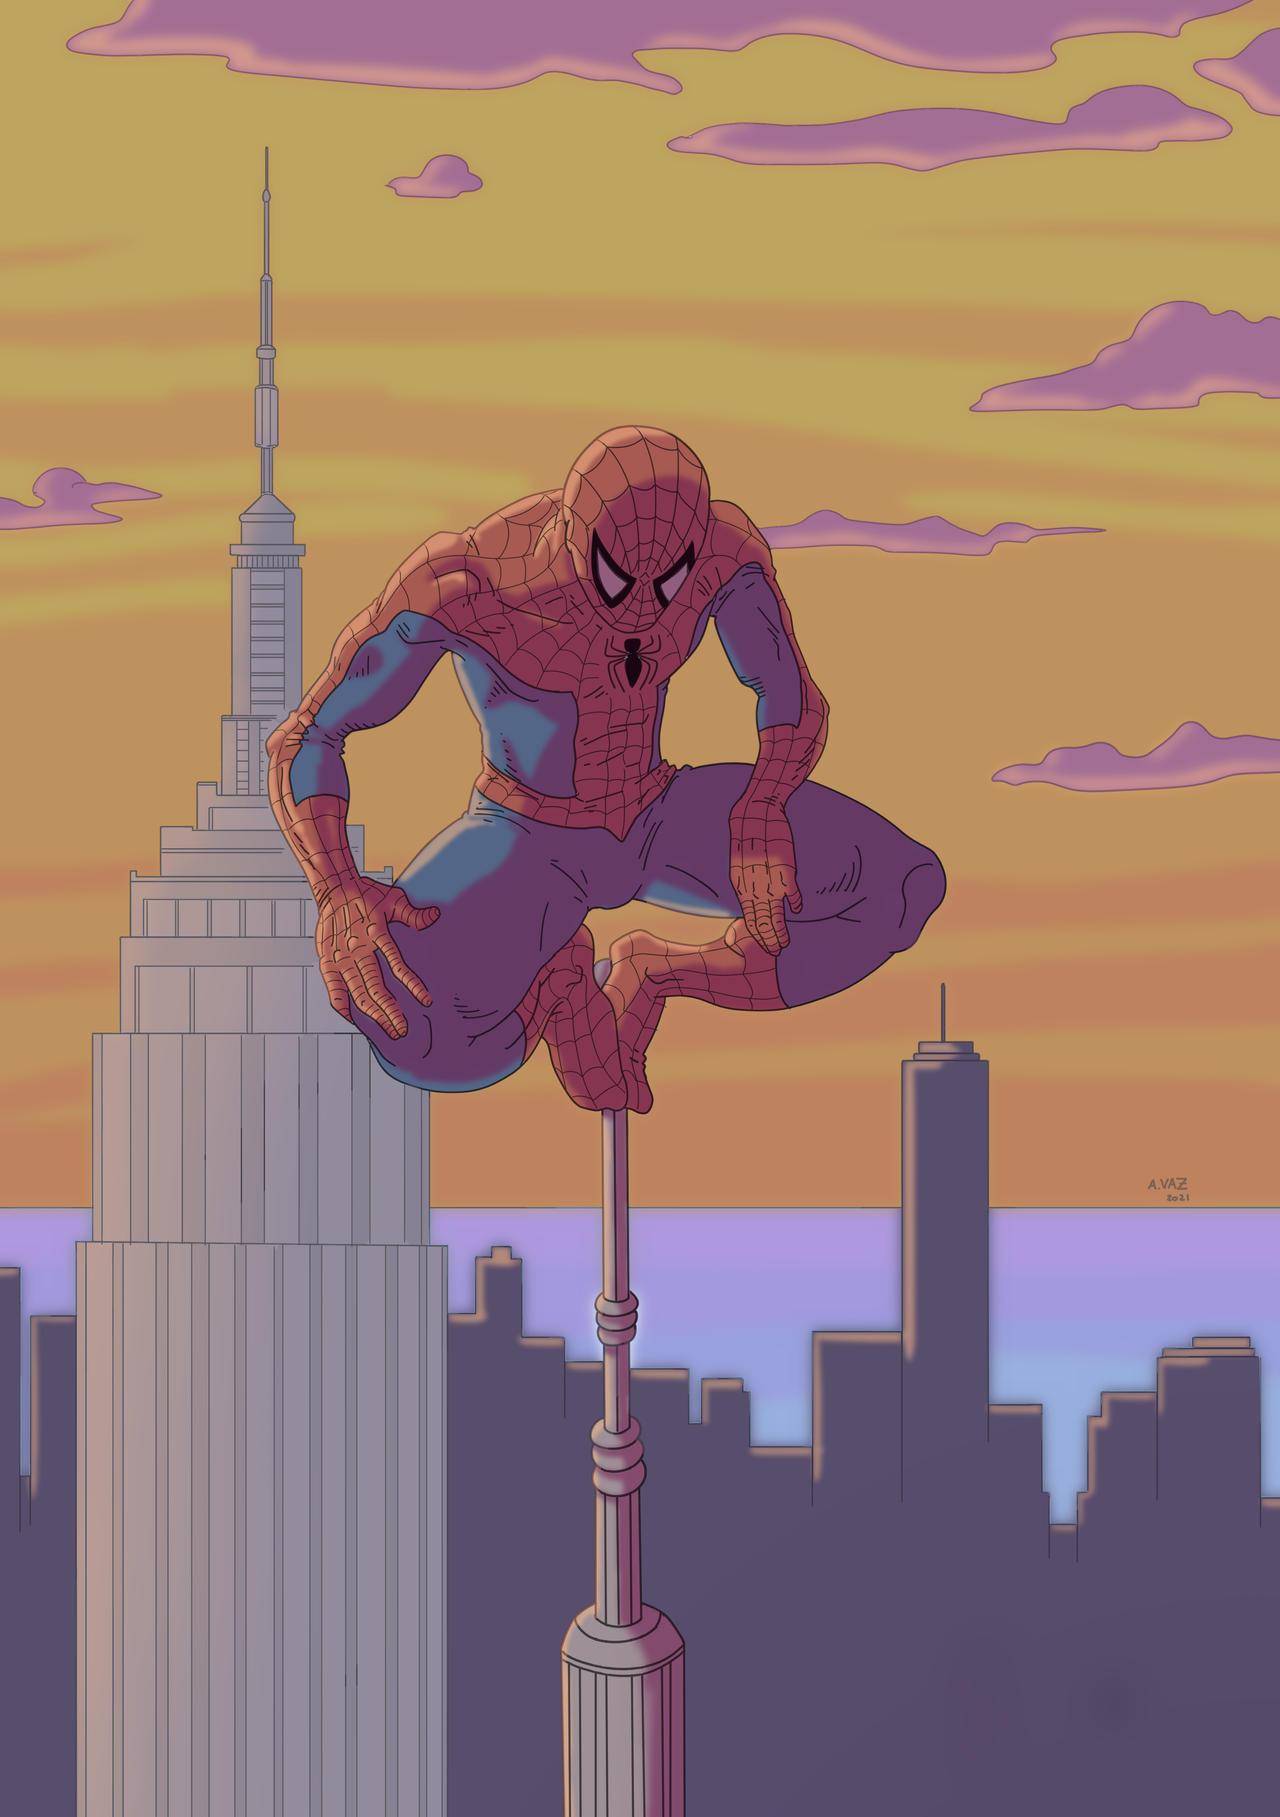 Spider-Man Empire State Building